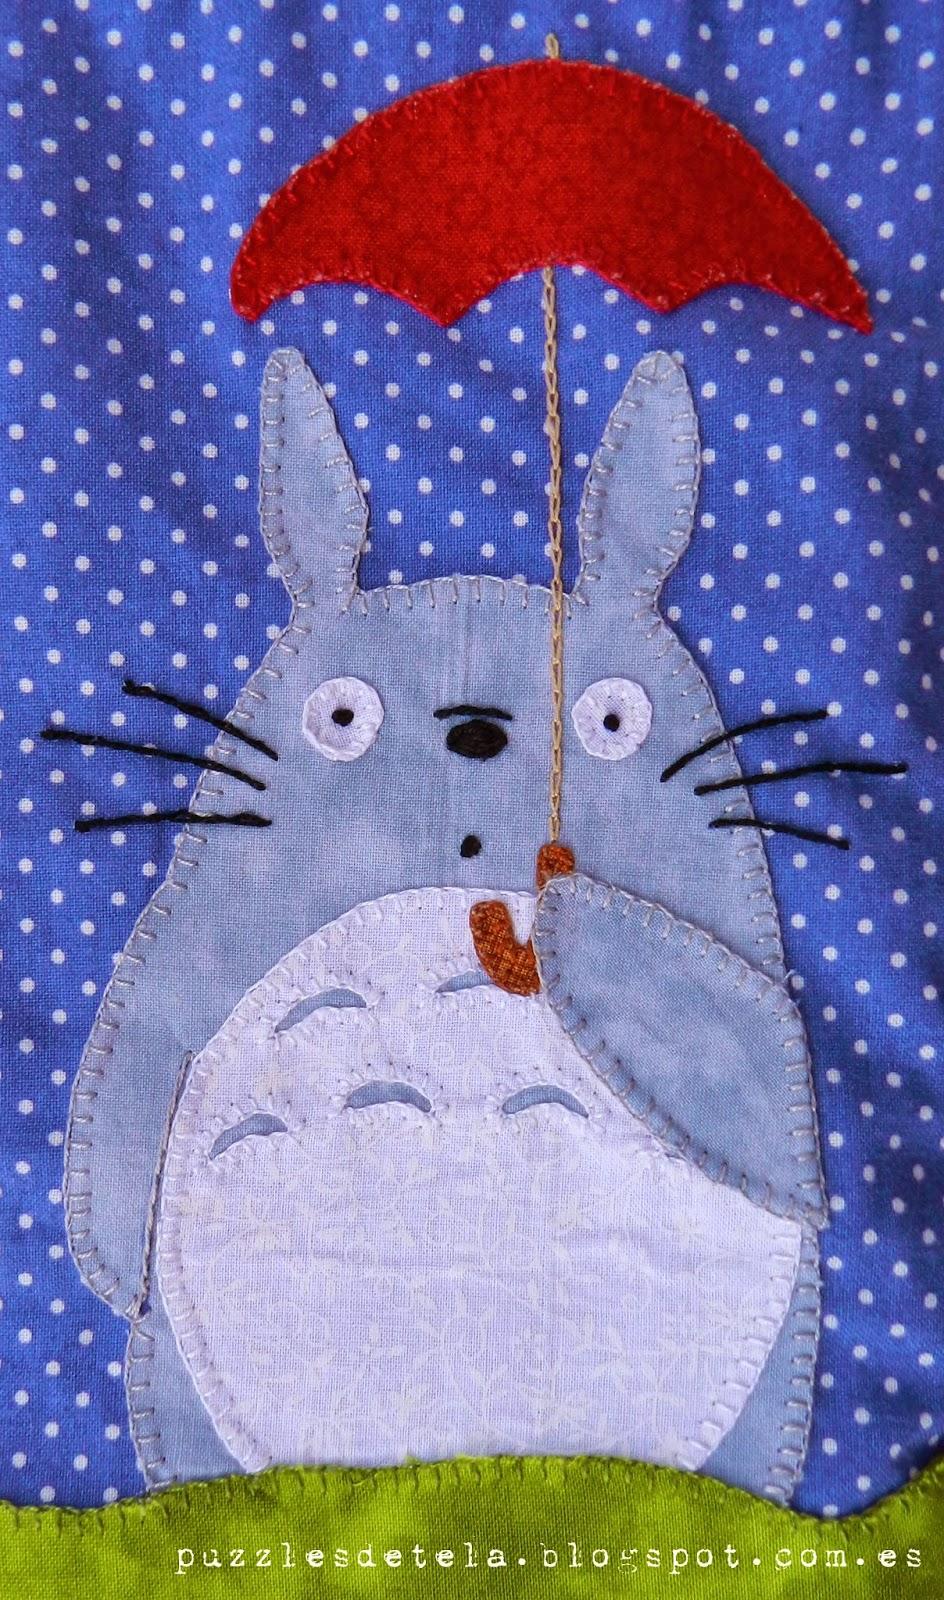 Bolsa merienda patchwork, bolsa merienda, Totoro, patchwork, aplicaciones patchwork, Puzzles de tela, puzzle de tela, bolsas patchwork